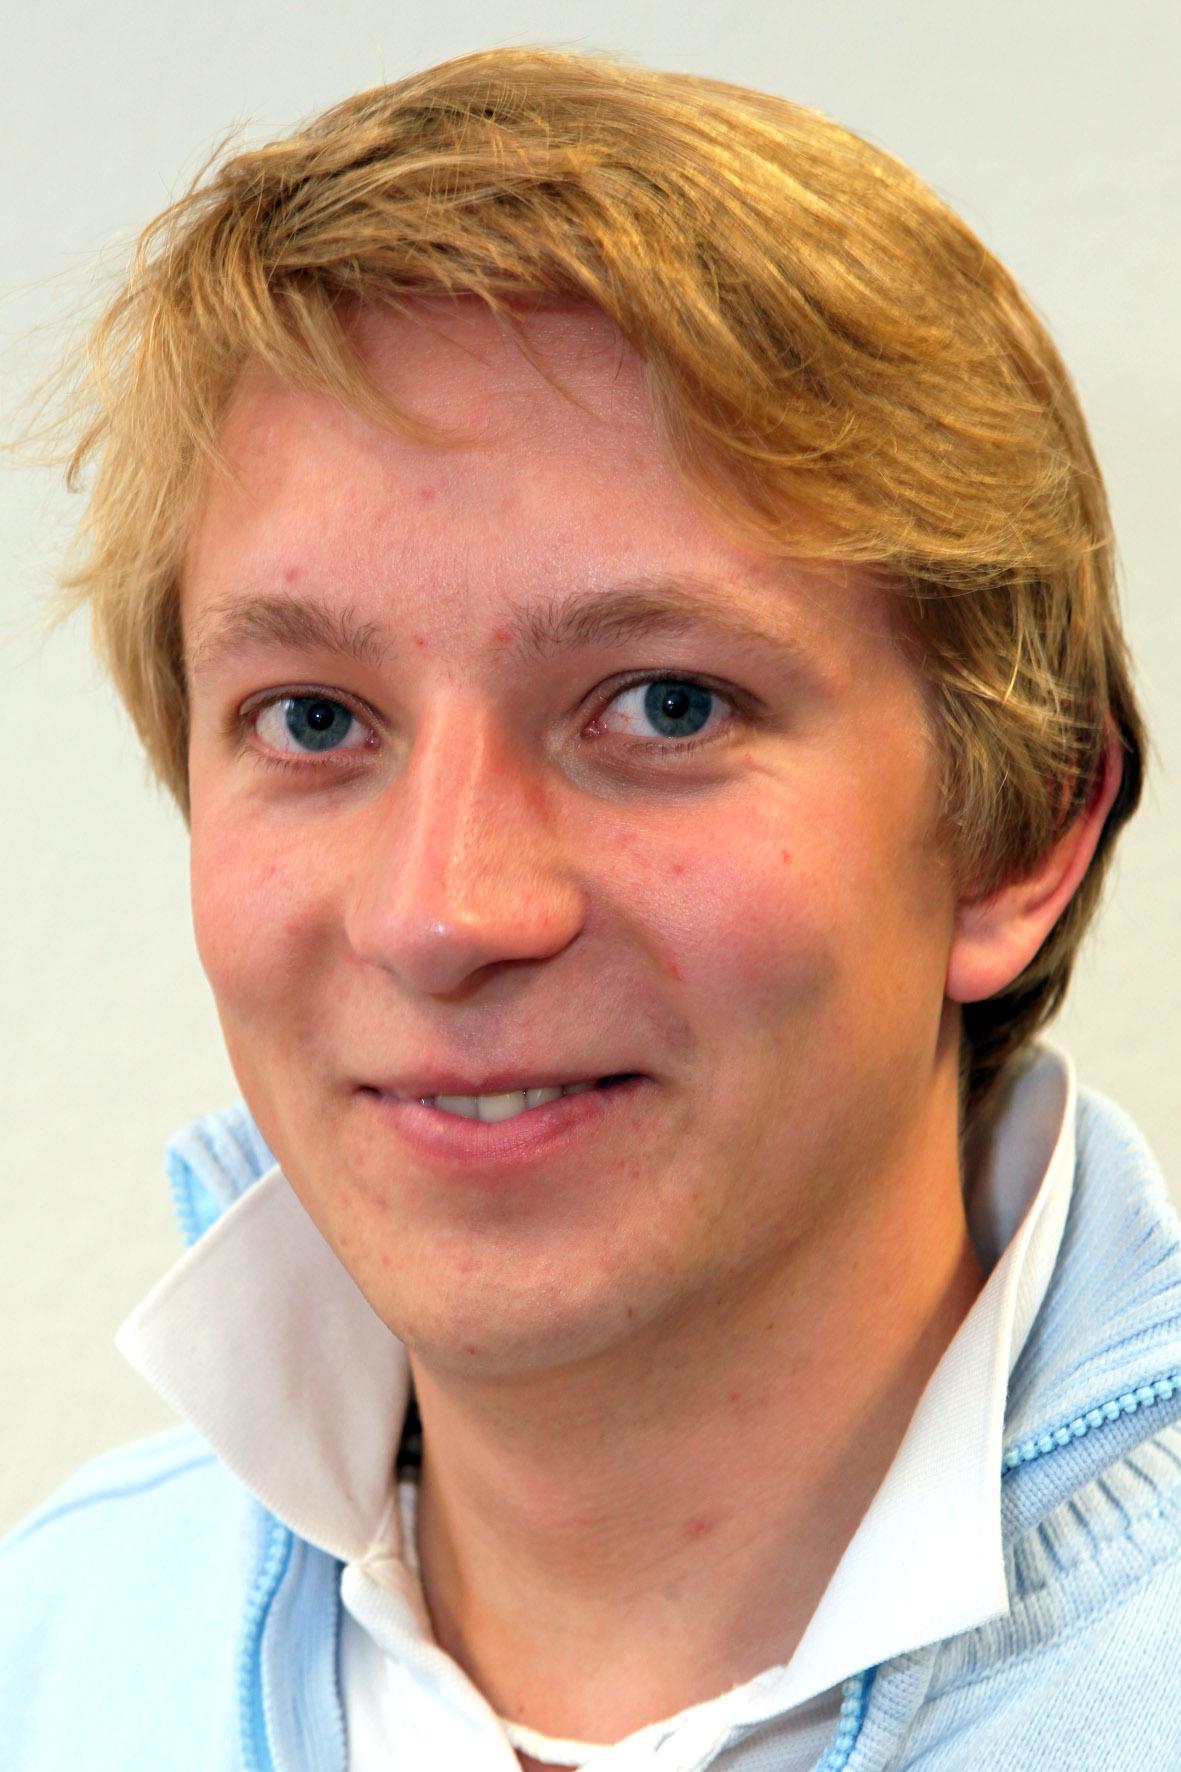 Dominik Heggemann Internetseeslsorge